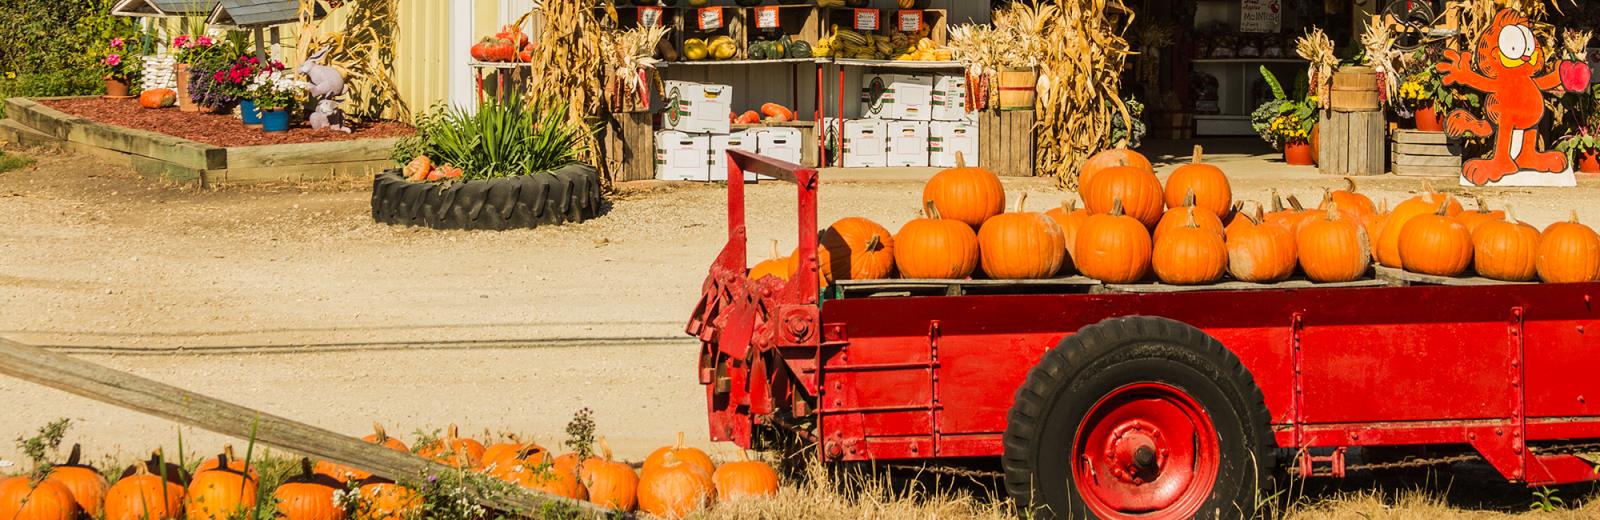 nieman-markets-pumpkins